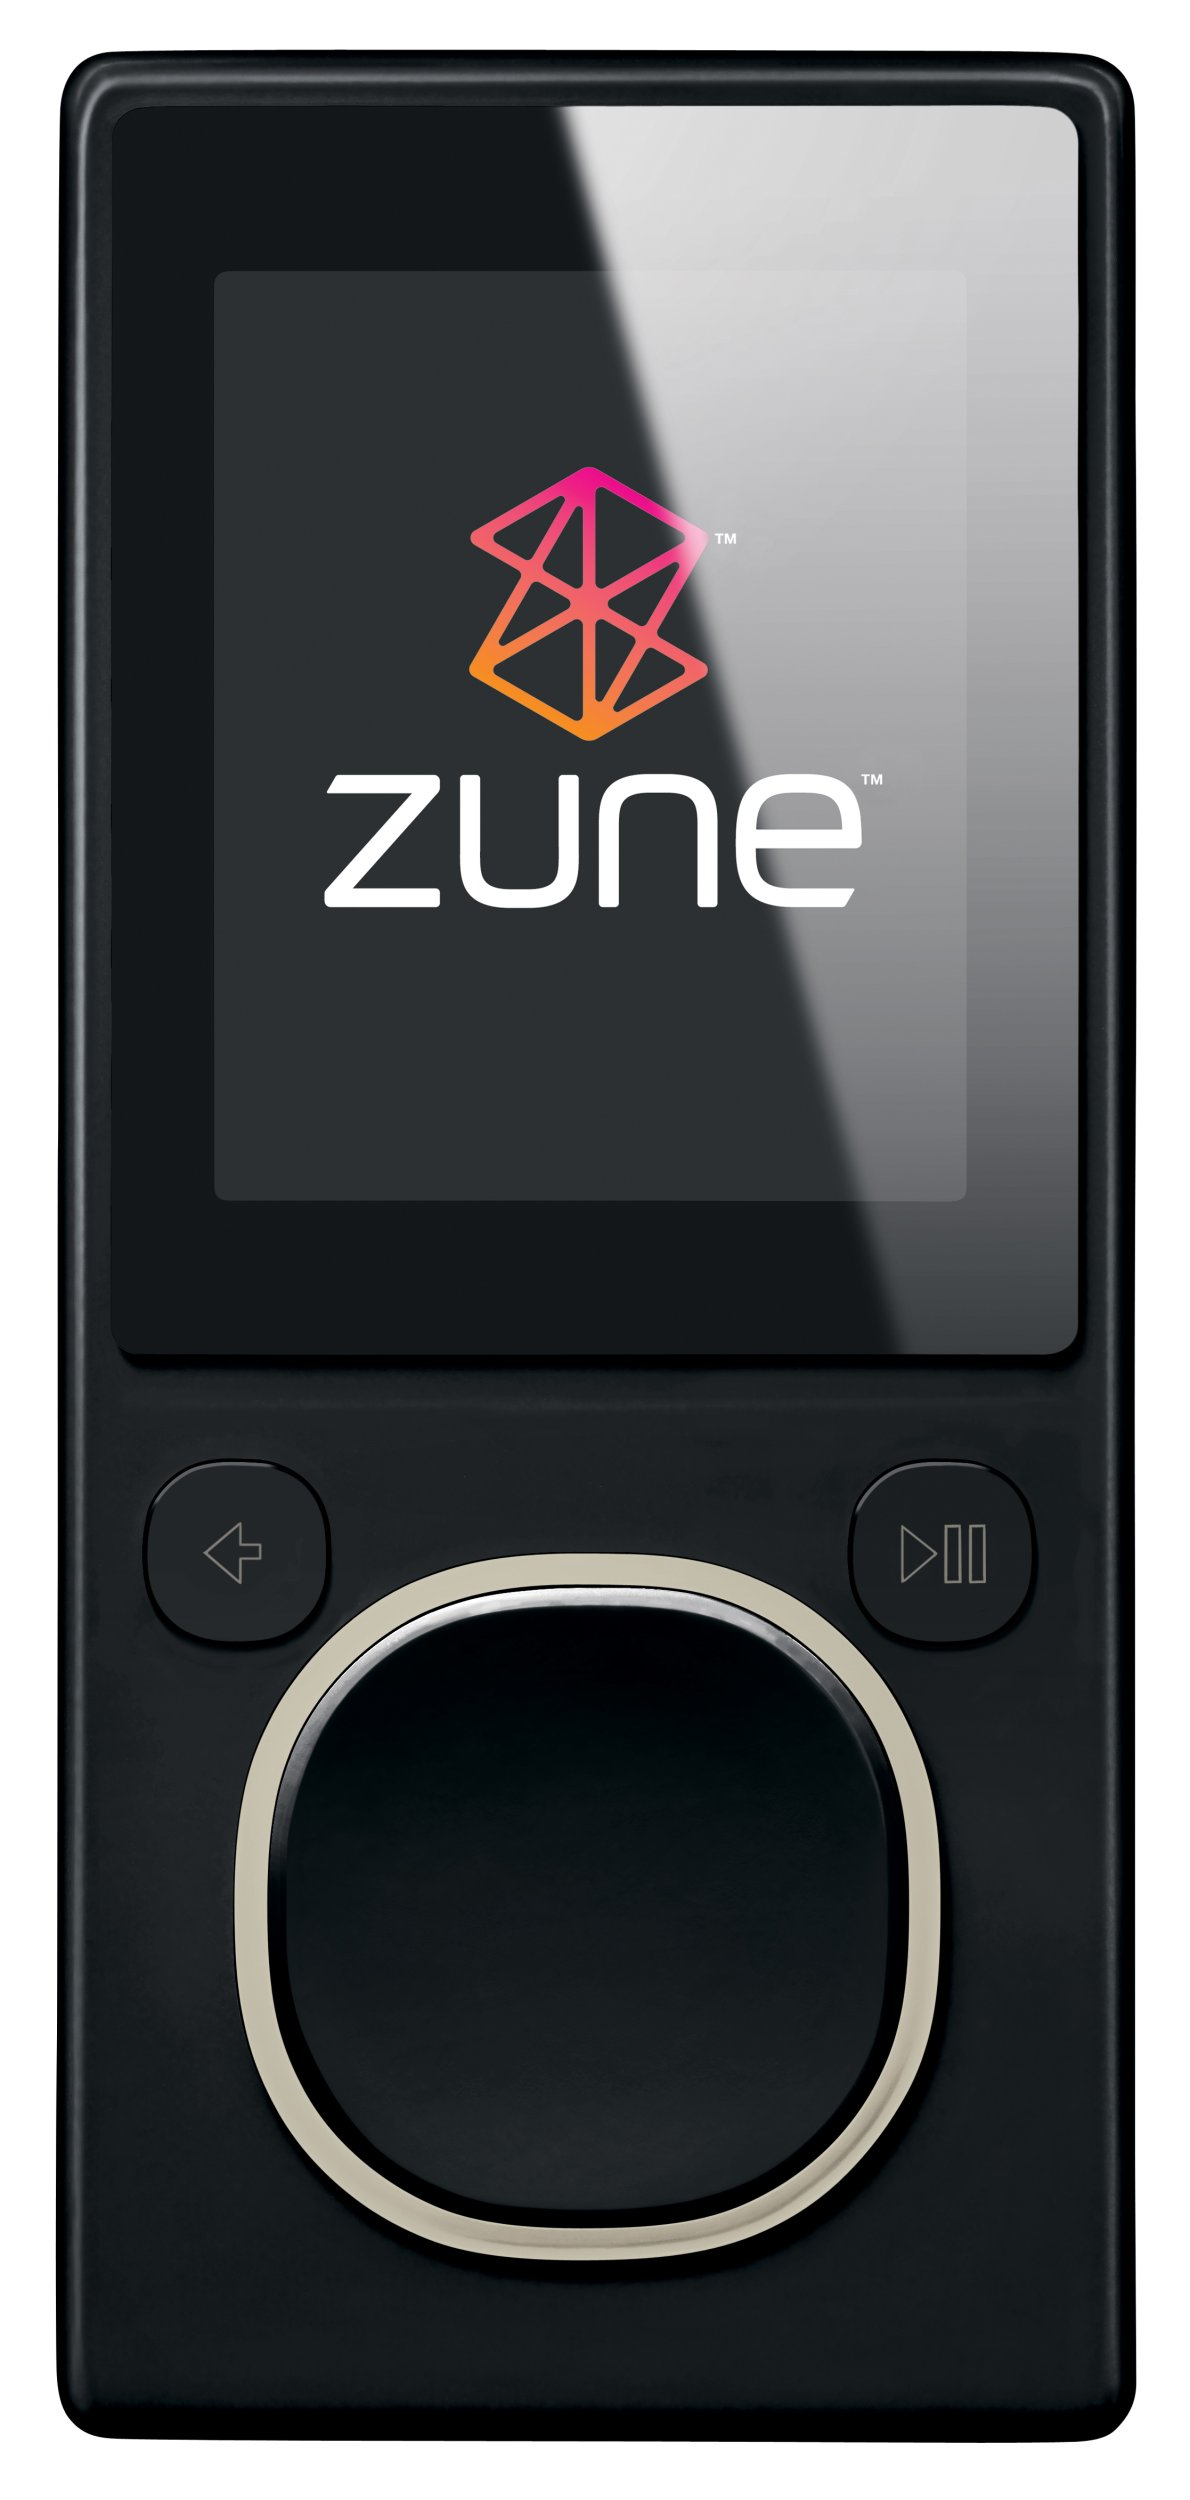 Zune 8 GB Digital Media Player (Black)